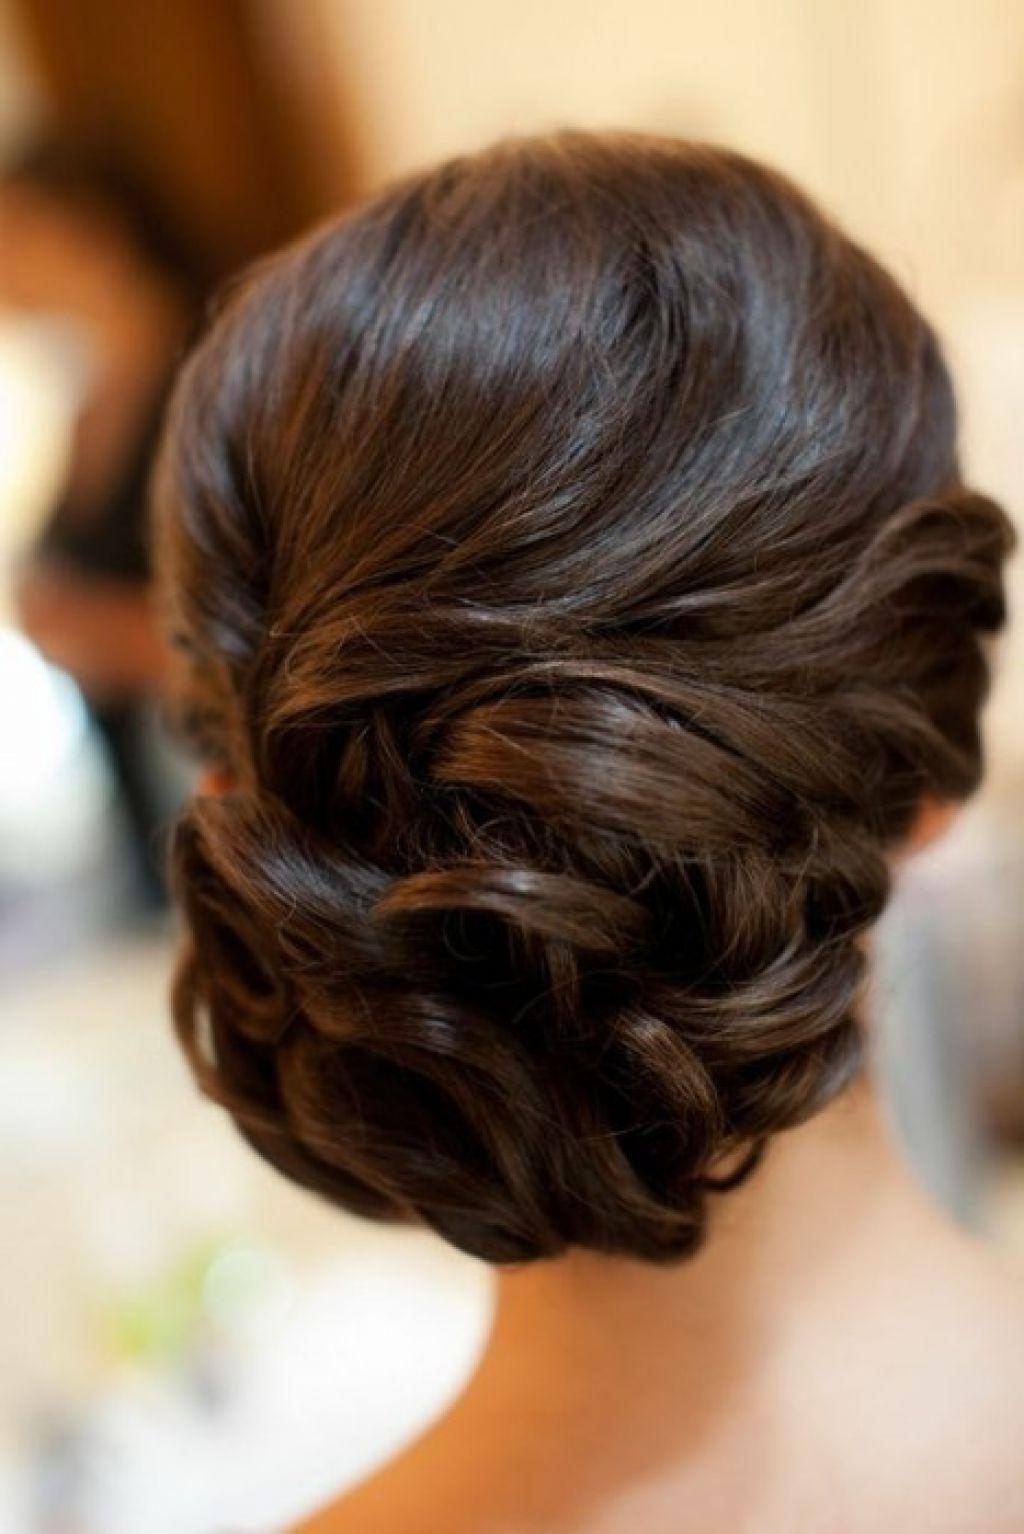 Updo Hairstyles For Wedding – Women Medium Haircut Within Wedding Updo Hairstyles (View 11 of 15)